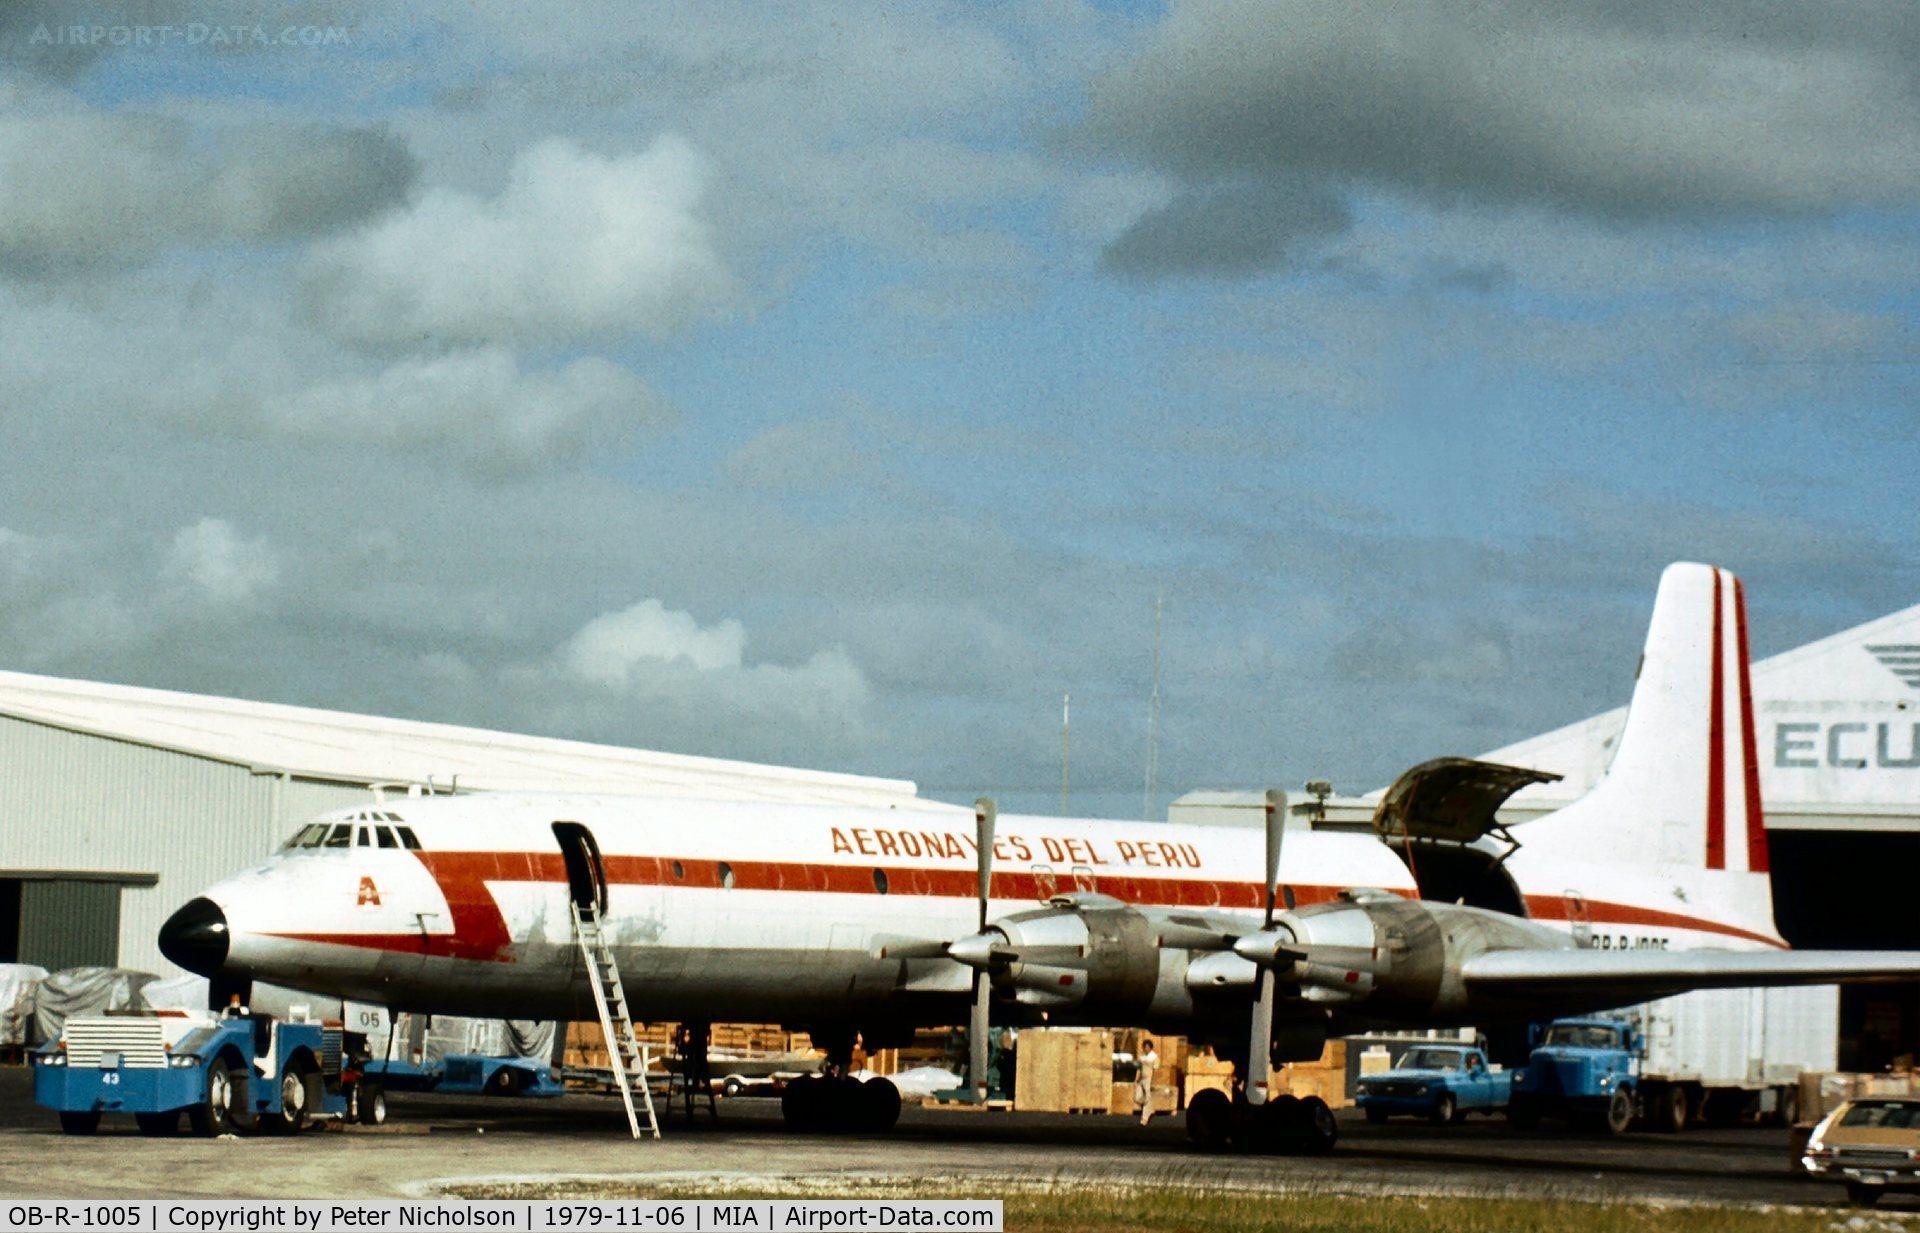 OB-R-1005, 1960 Canadair CL-44-6 (CC-106 Yukon) C/N 6, CL-44-D6 of Aeronaves Del Peru at Miami in November 1979.